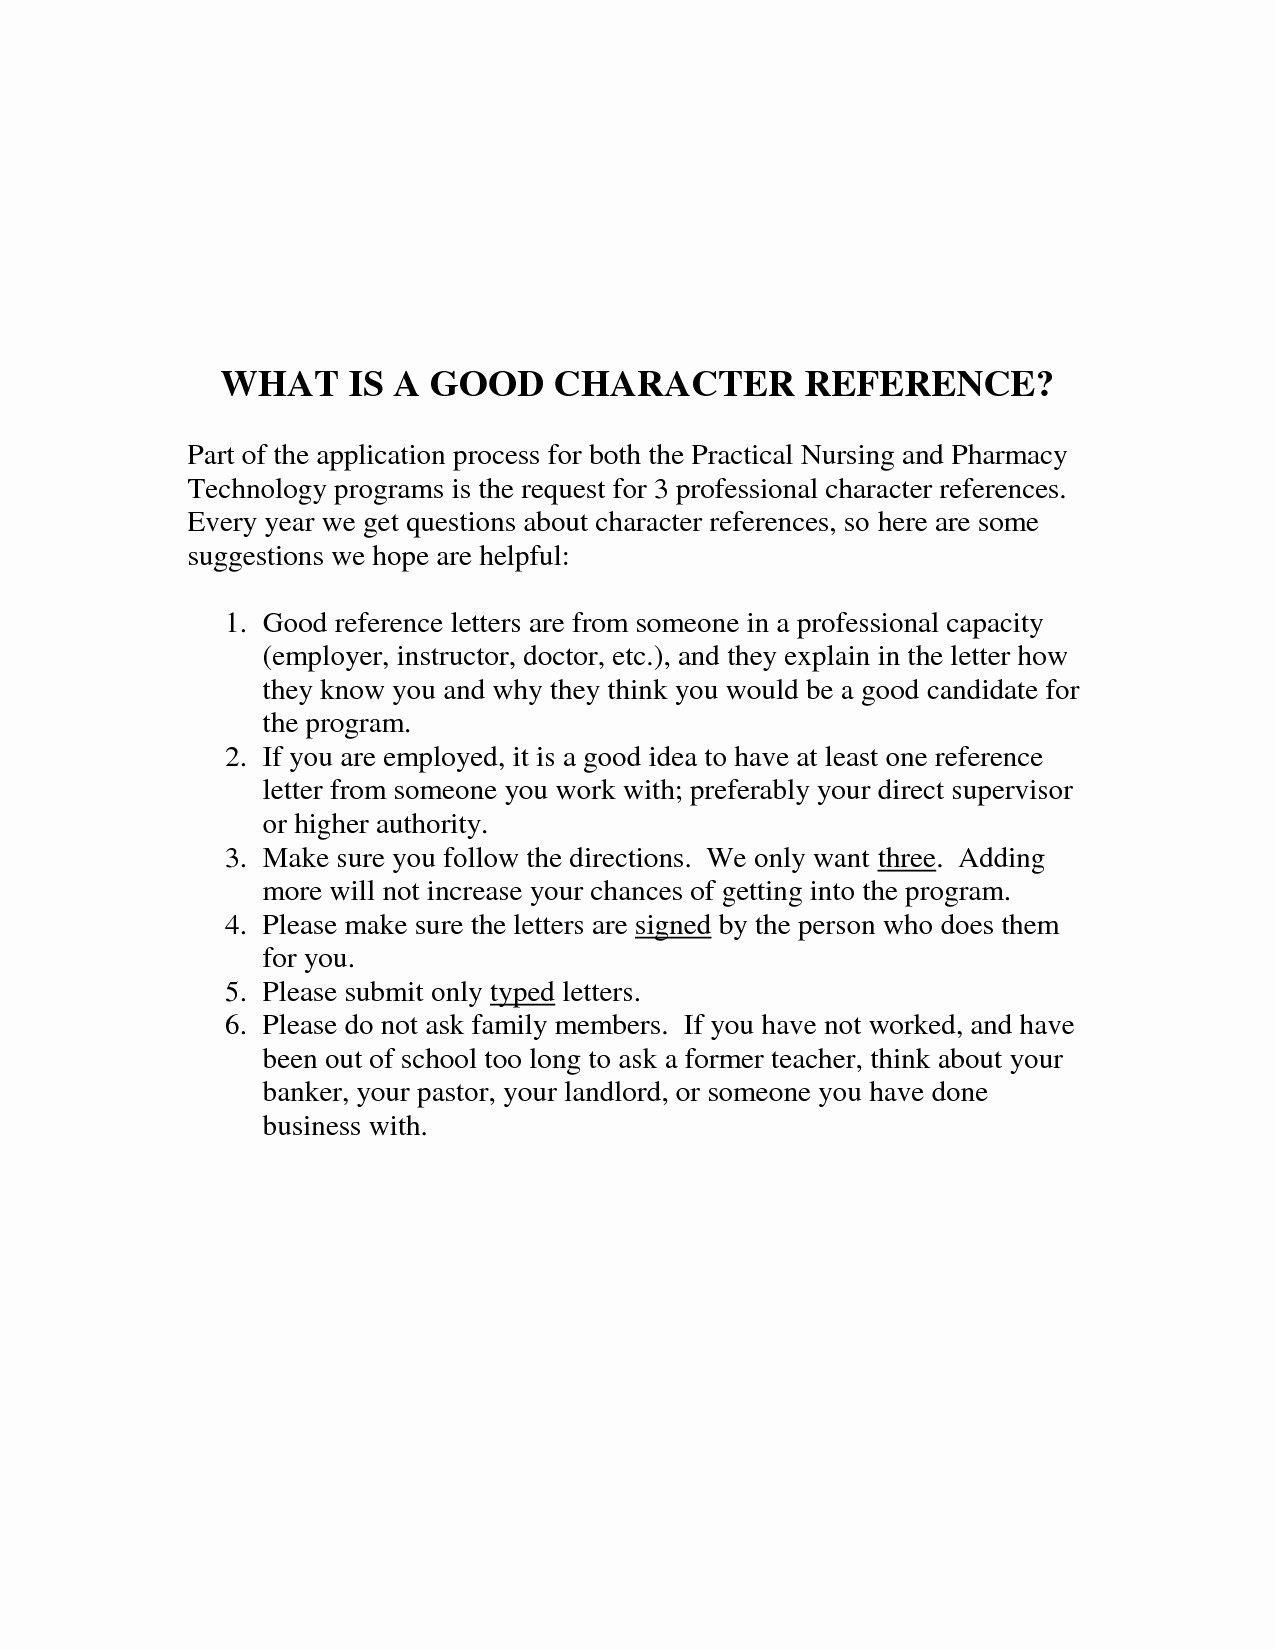 Good Moral Character Letter Sample